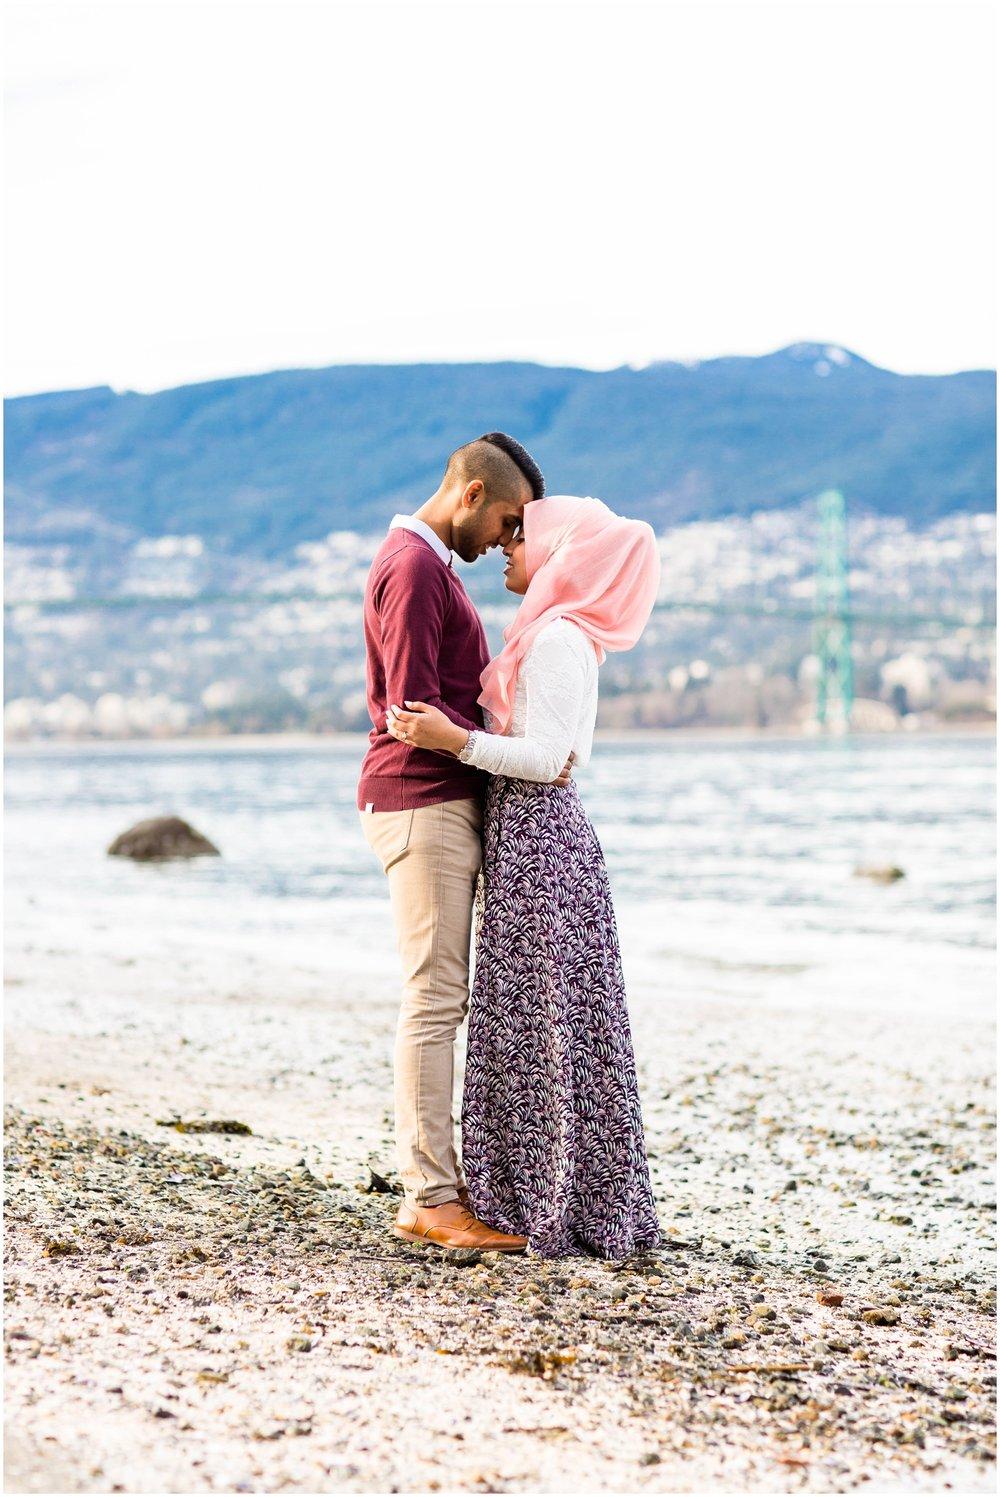 Stanley-Park-Engagement-Vancouver-Toronto-Mississauga-GTA-Pakistani-Indian-Wedding-Photography-Photographer_0089.jpg